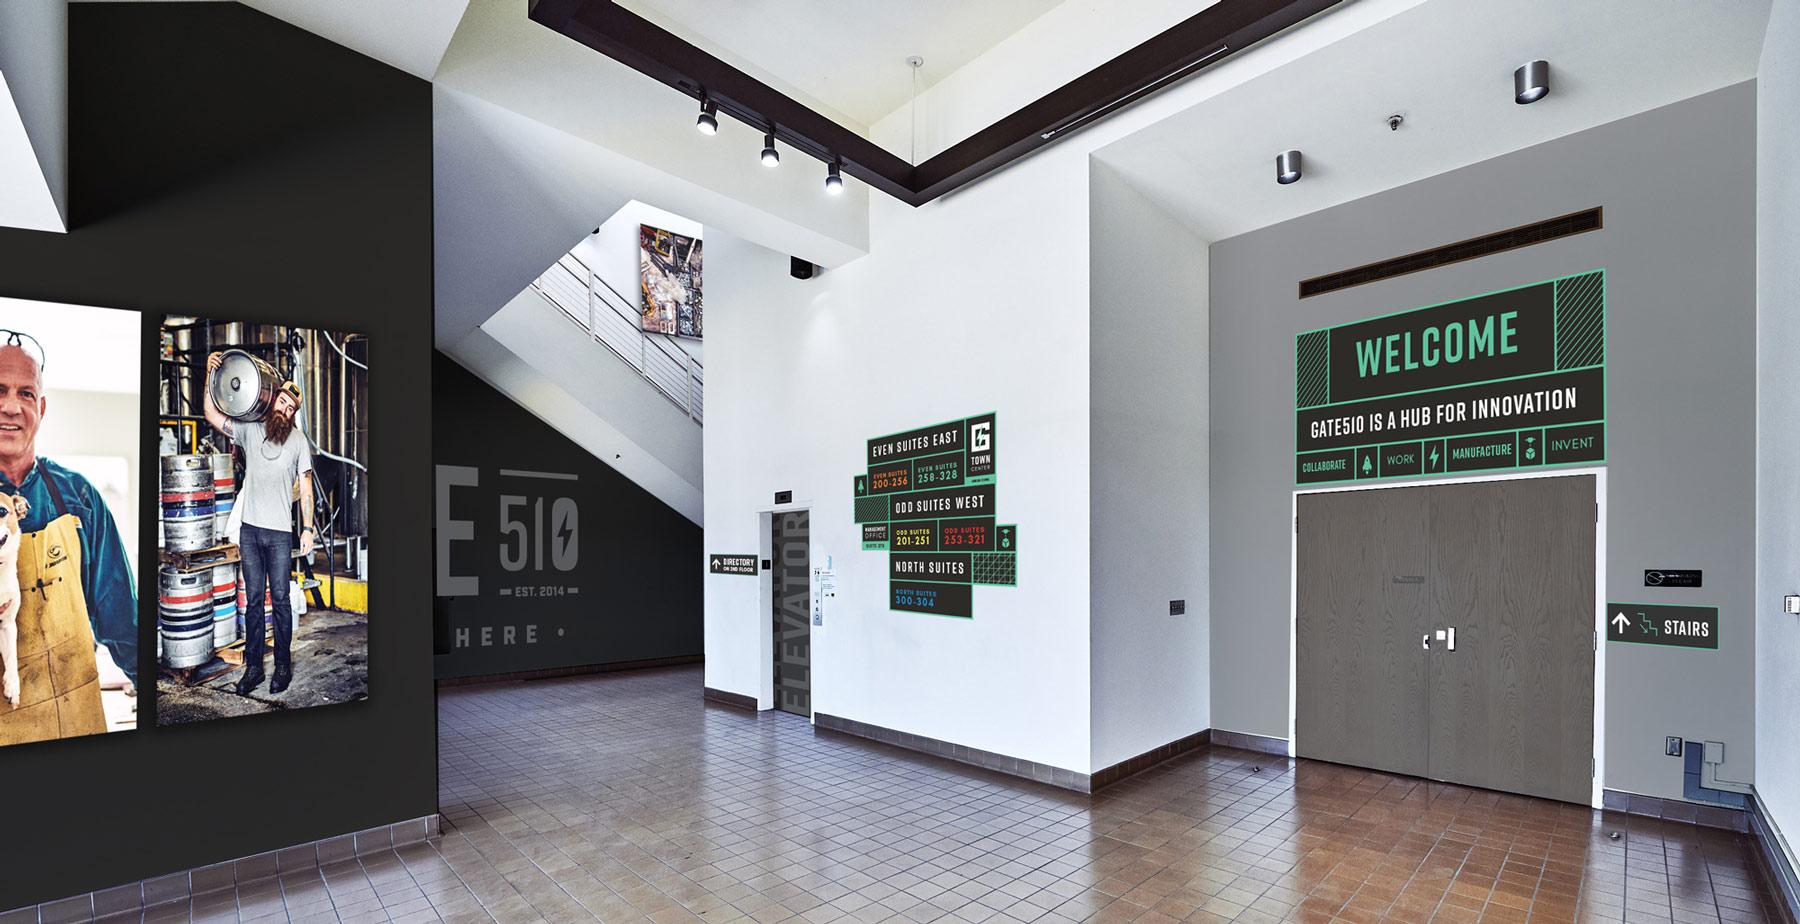 Gate510-north-lobby-after.jpg